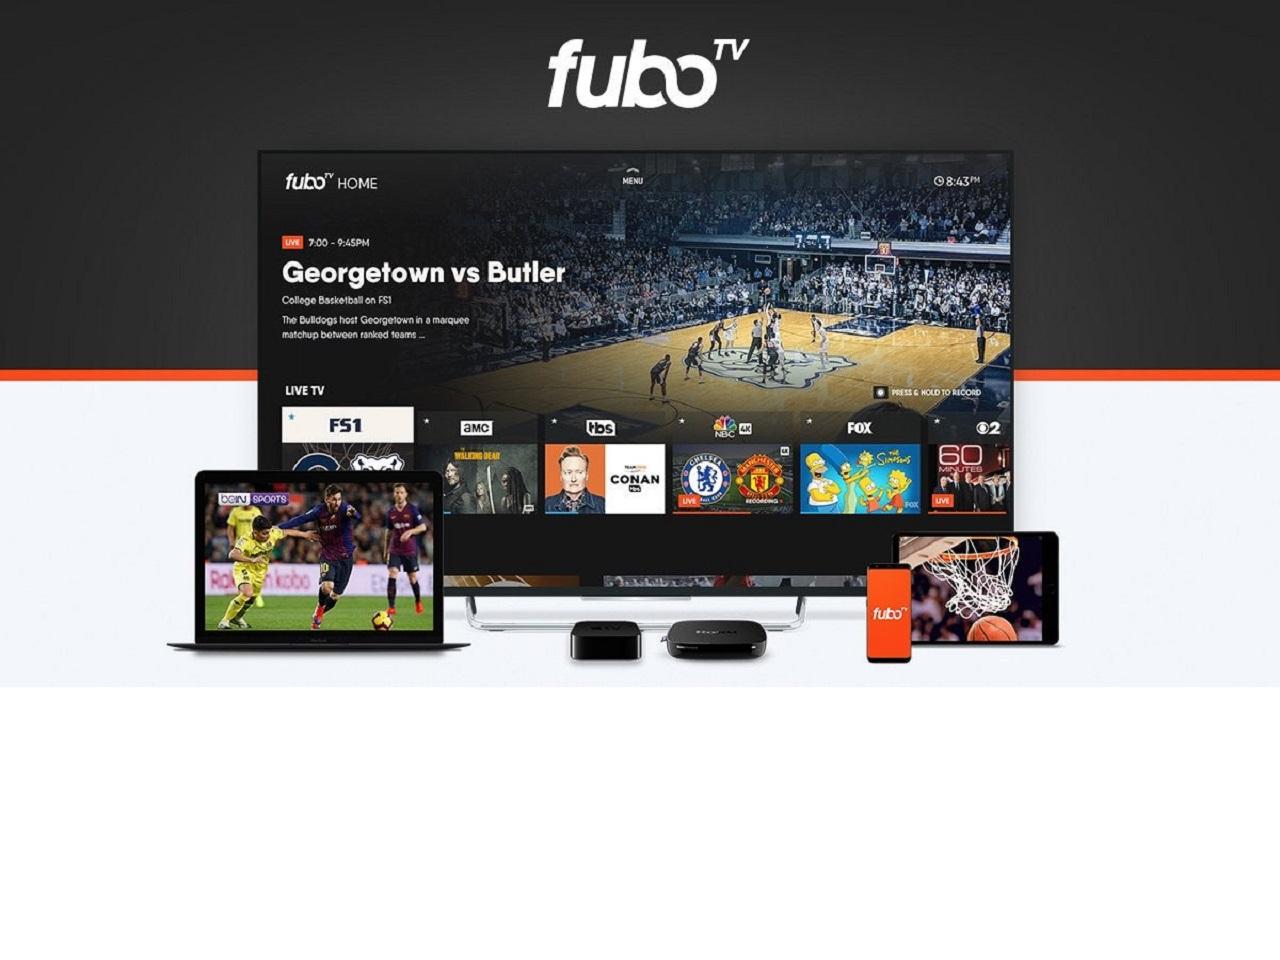 Qué es fuboTV